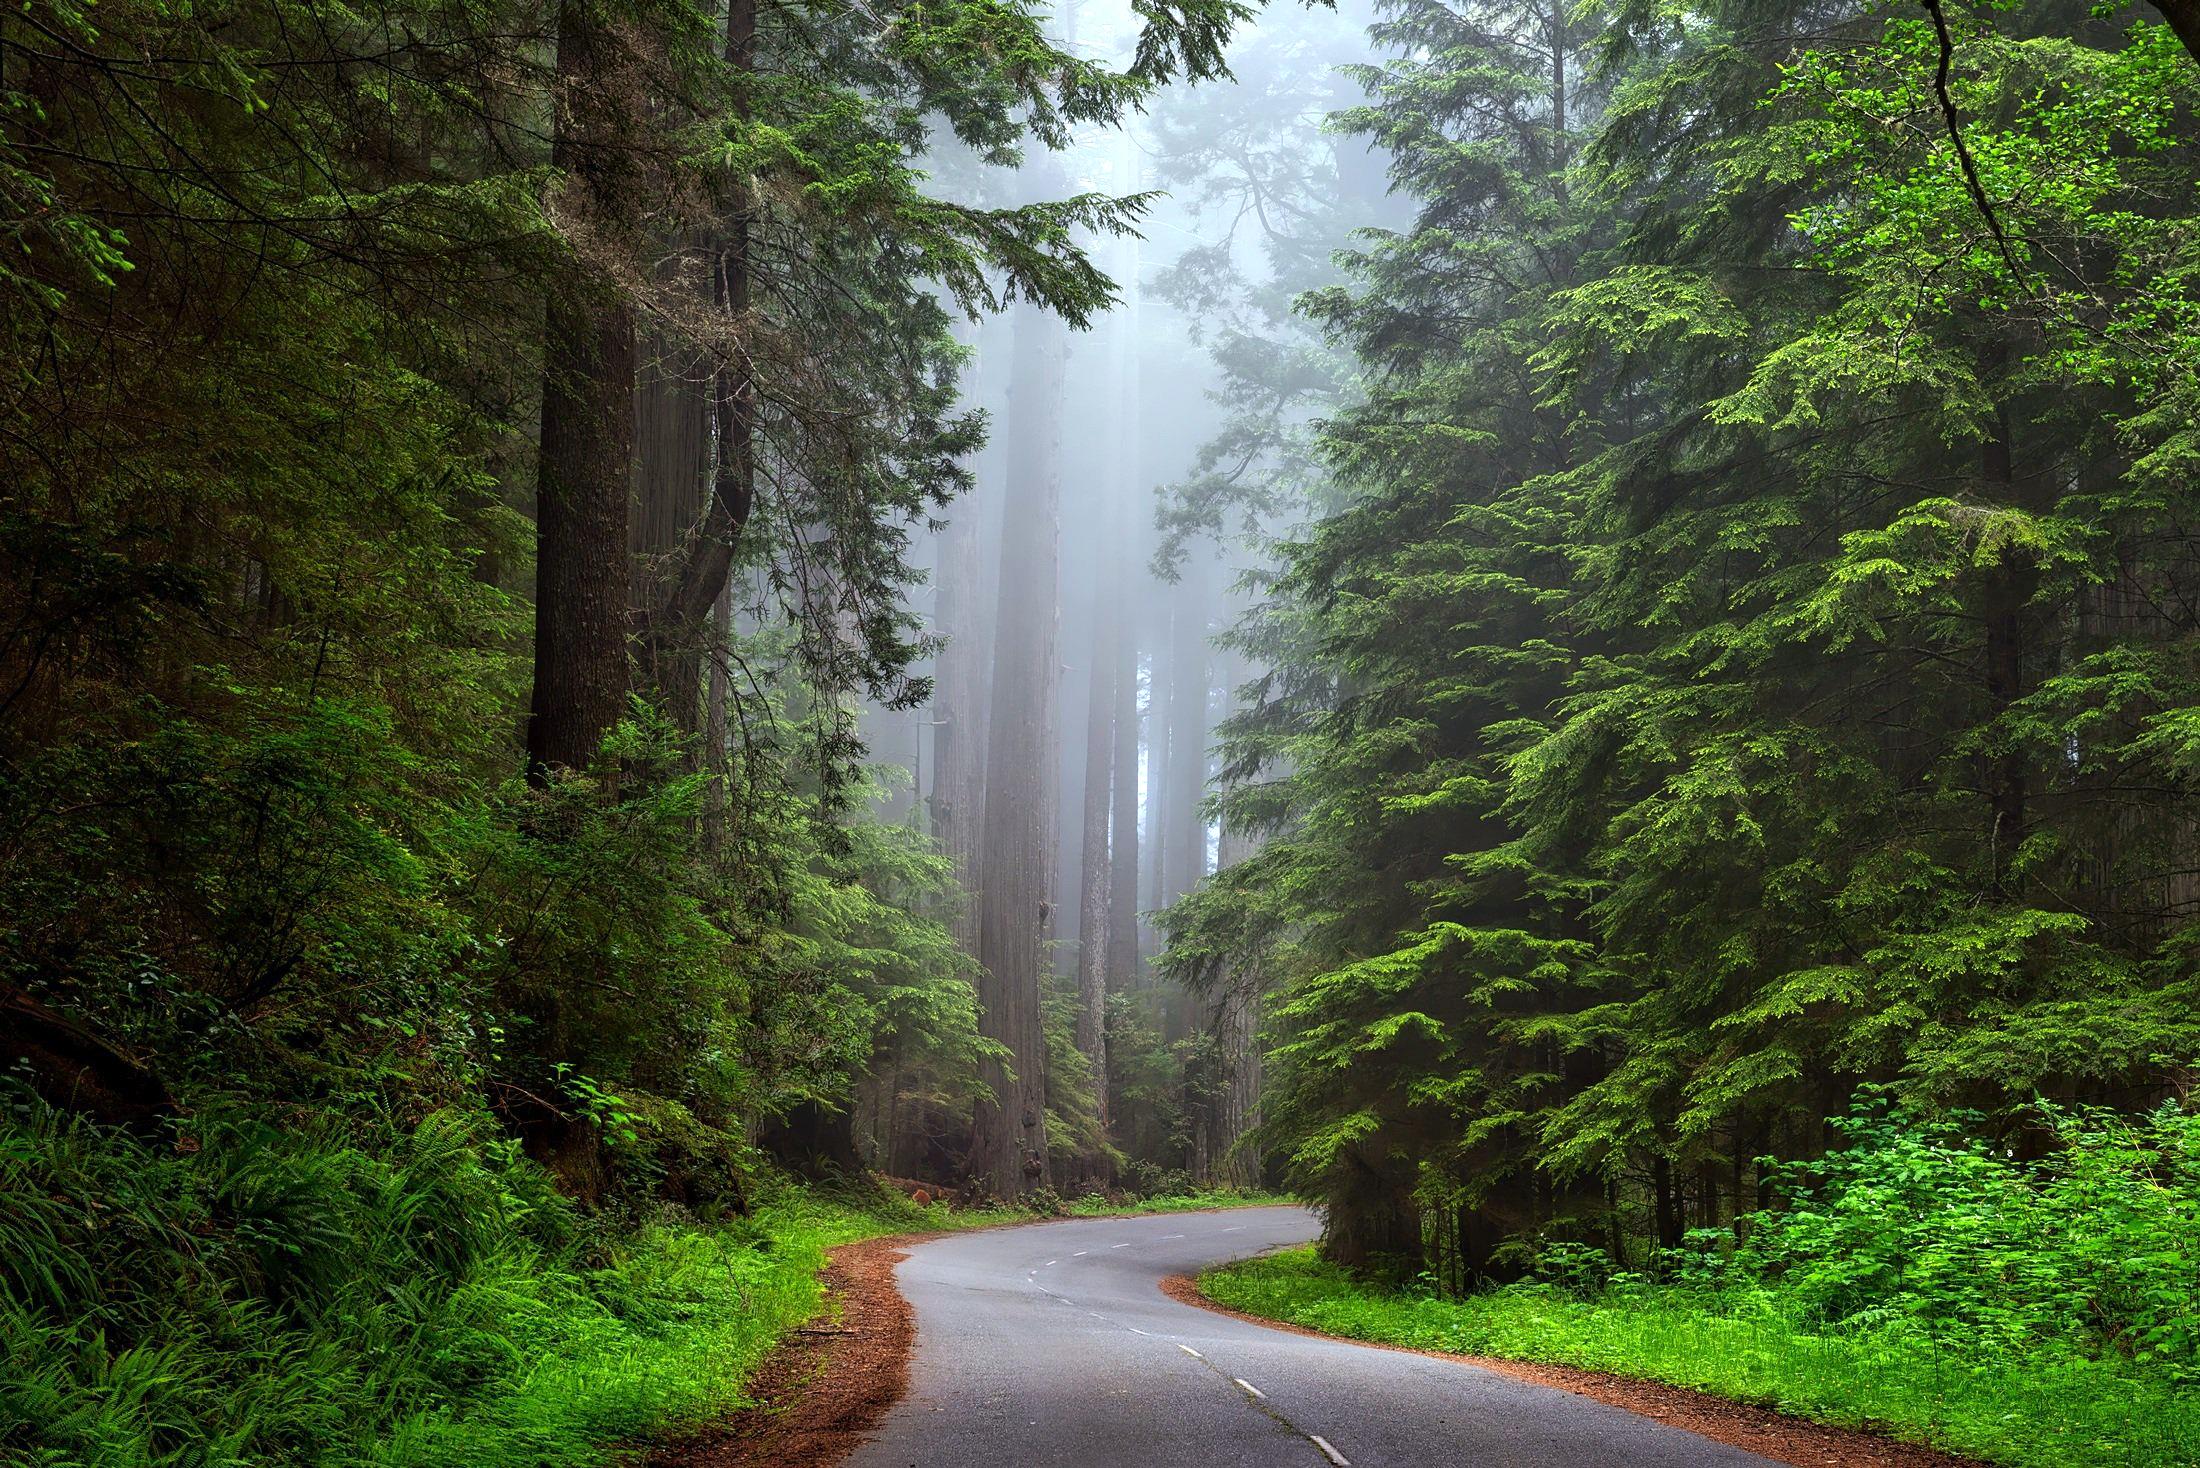 Trees Road 2200x1468